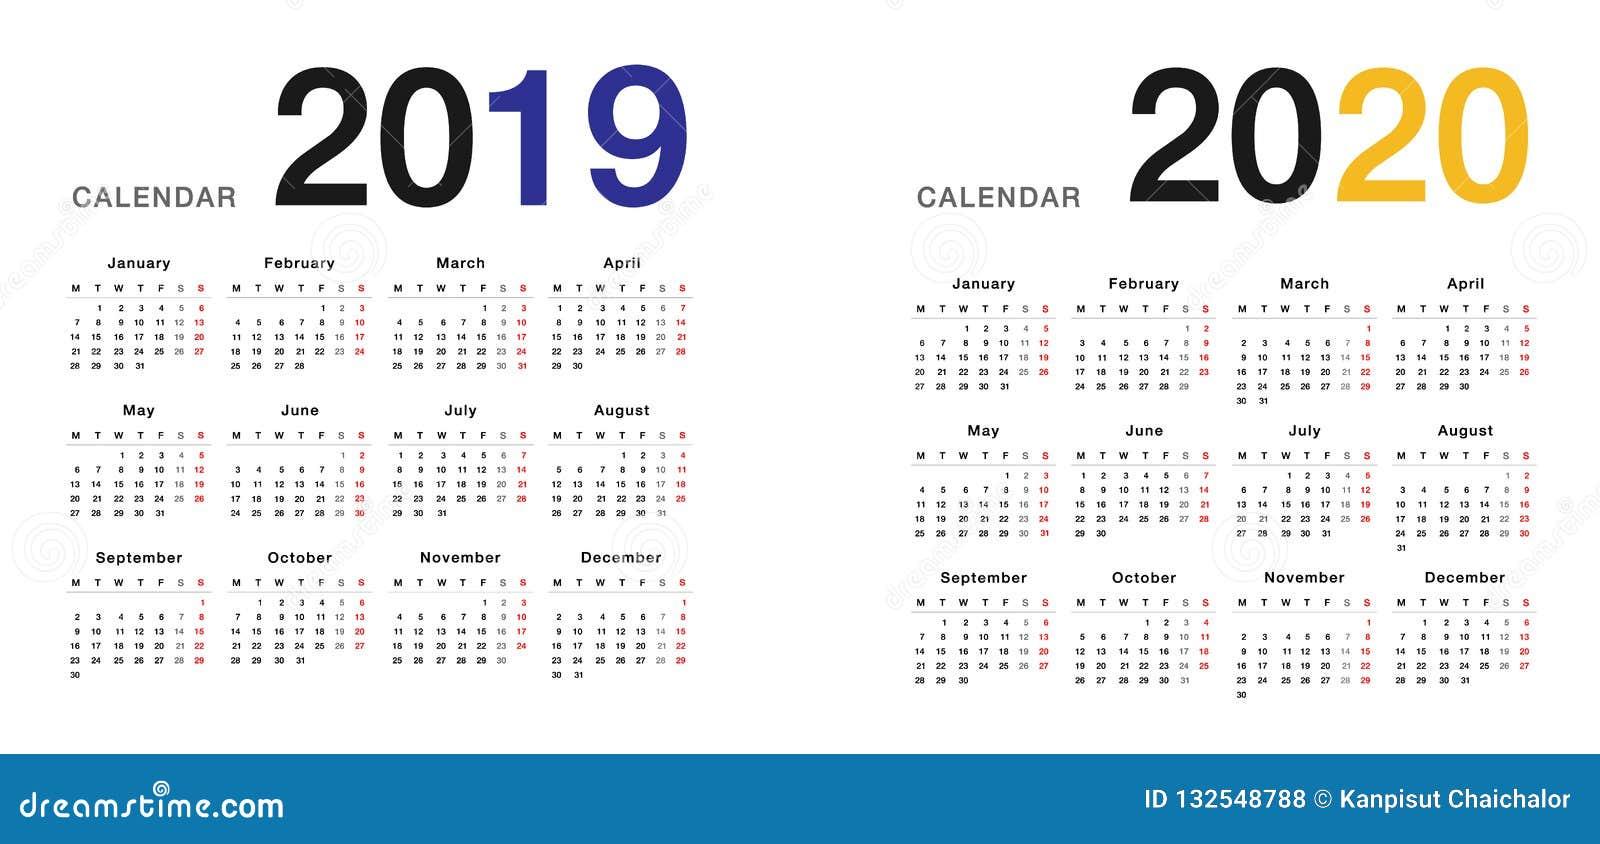 Calendar Year 2020.Colorful Year 2019 And Year 2020 Calendar Horizontal Vector Design